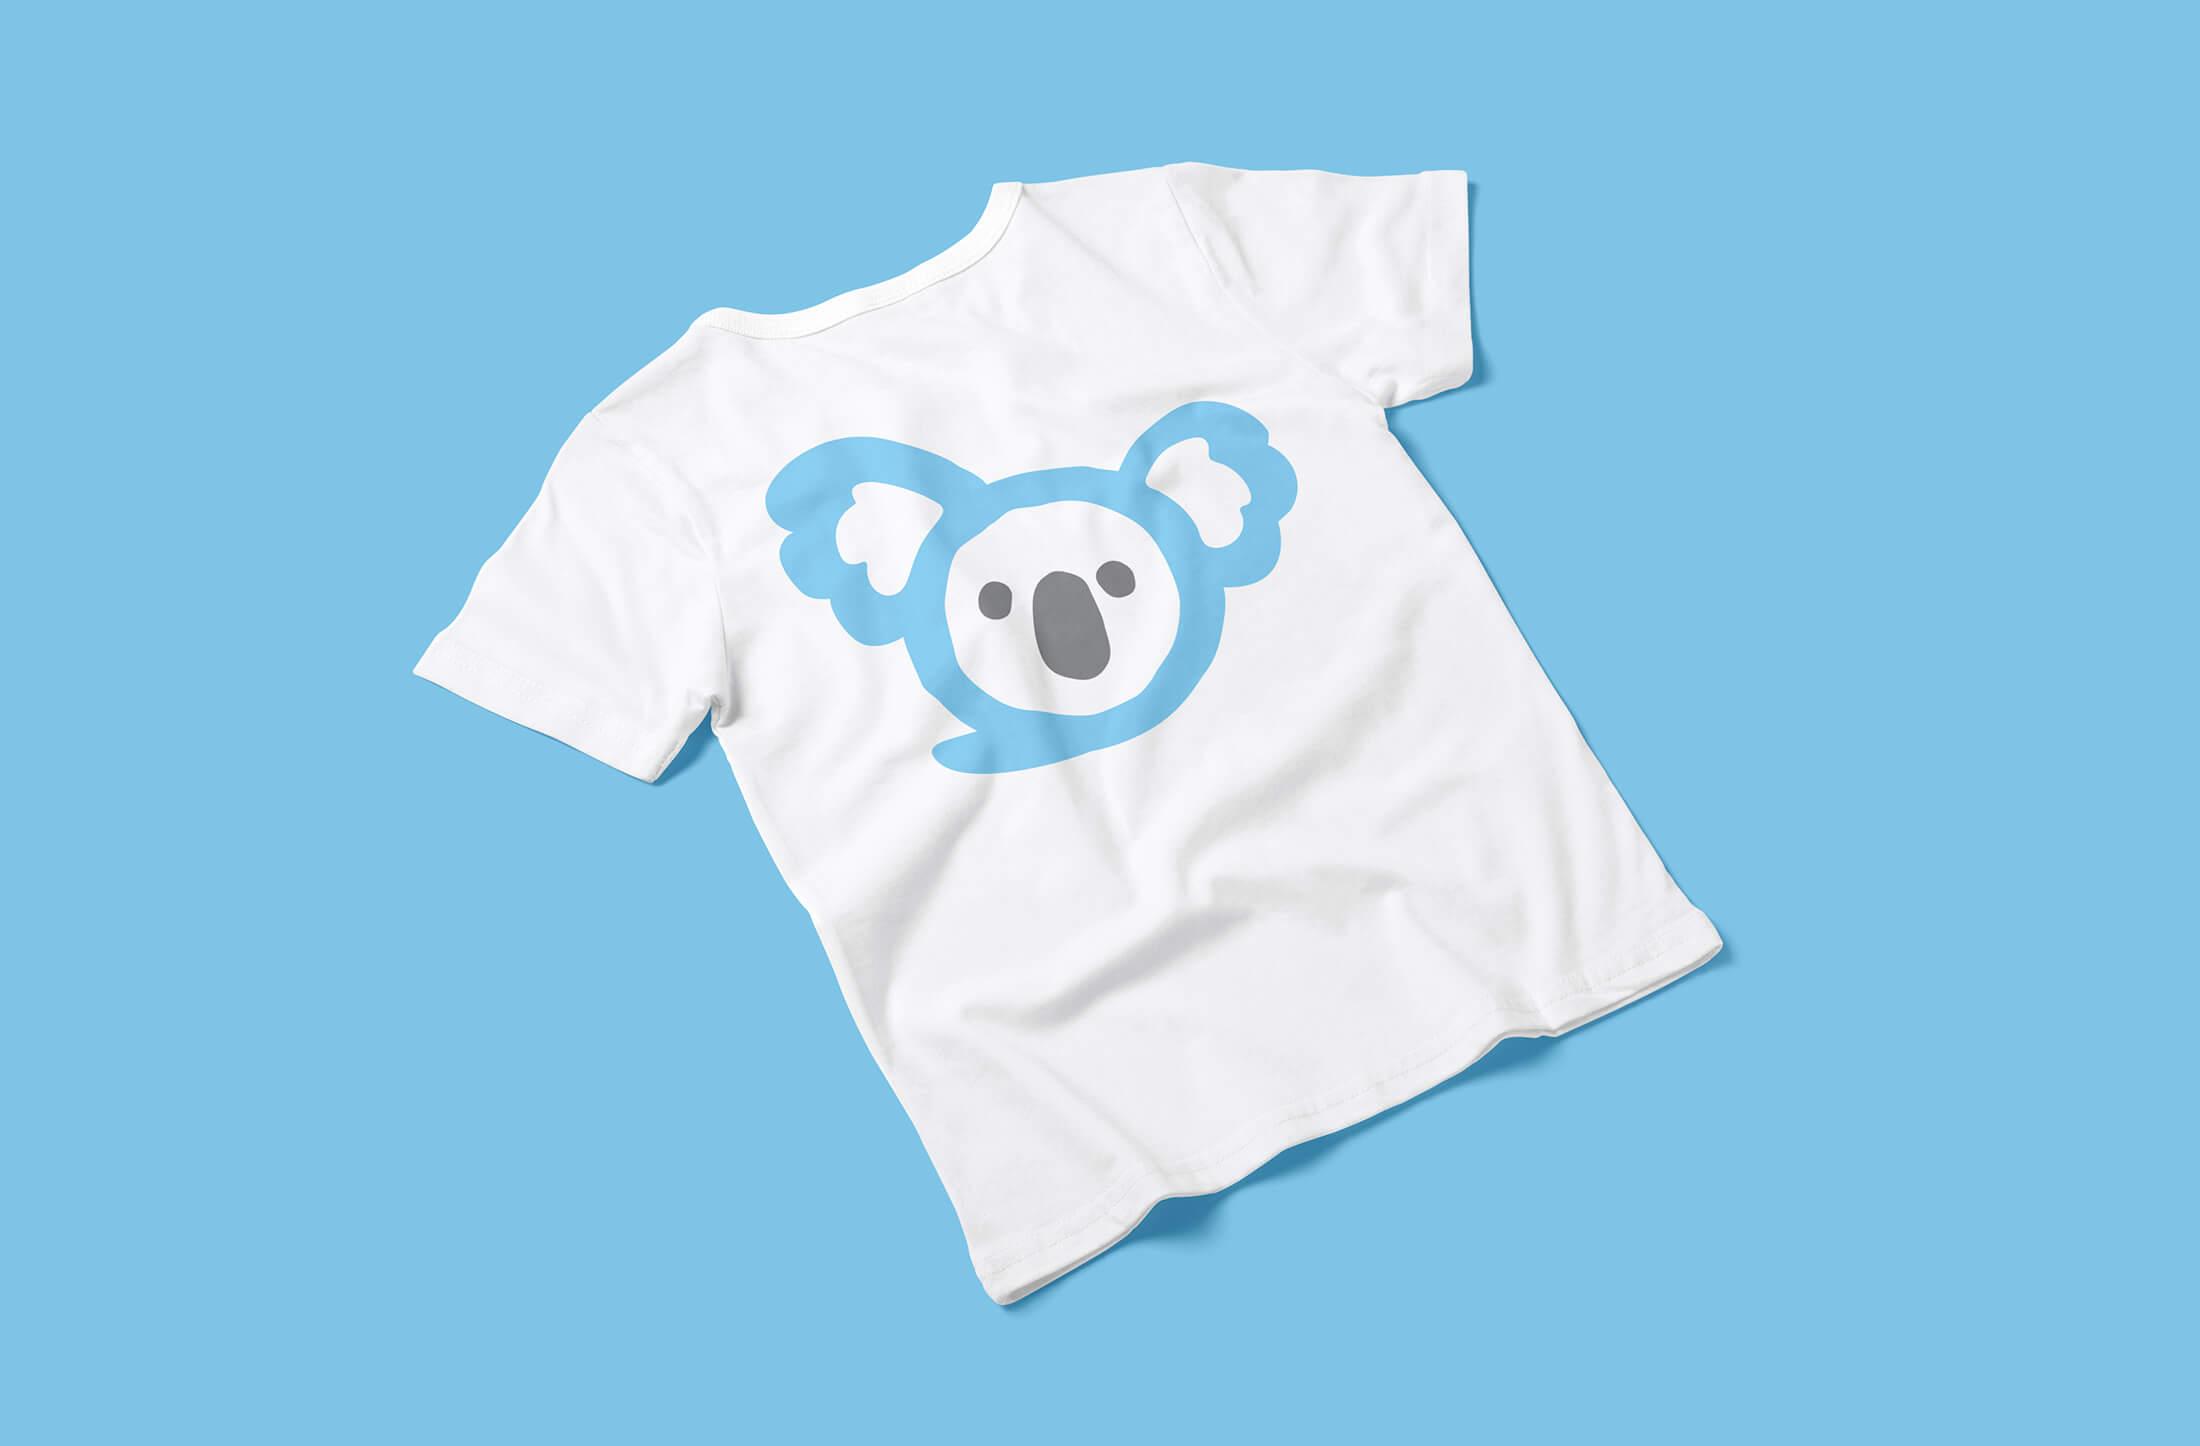 127-t-shirt-mockup-05